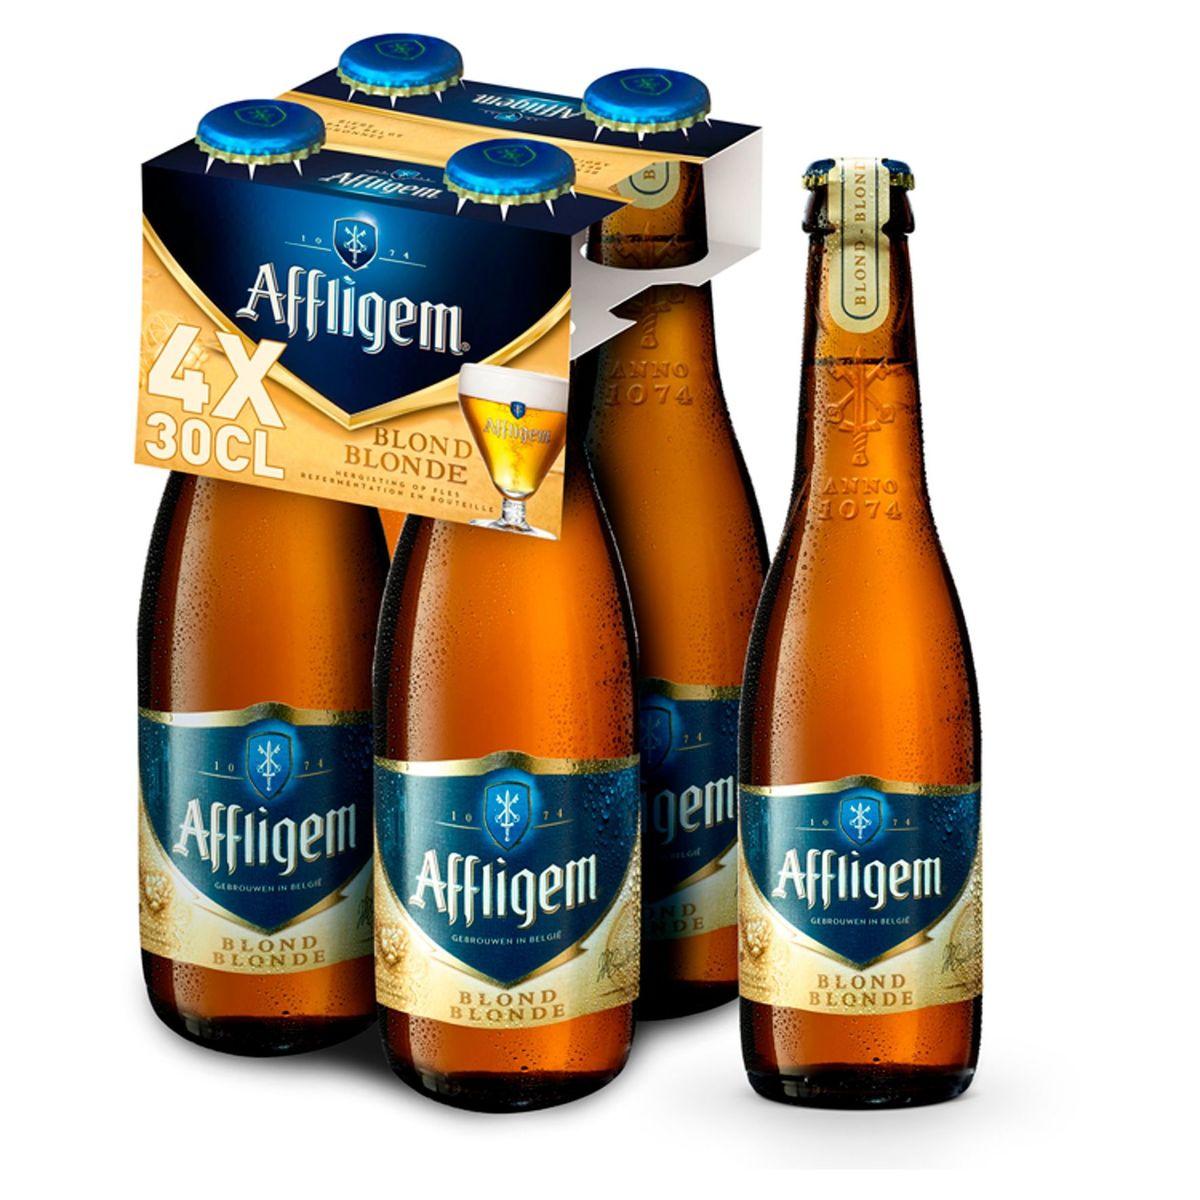 Affligem Abdijbier Tripel 9% ALC Fles 4x30cl